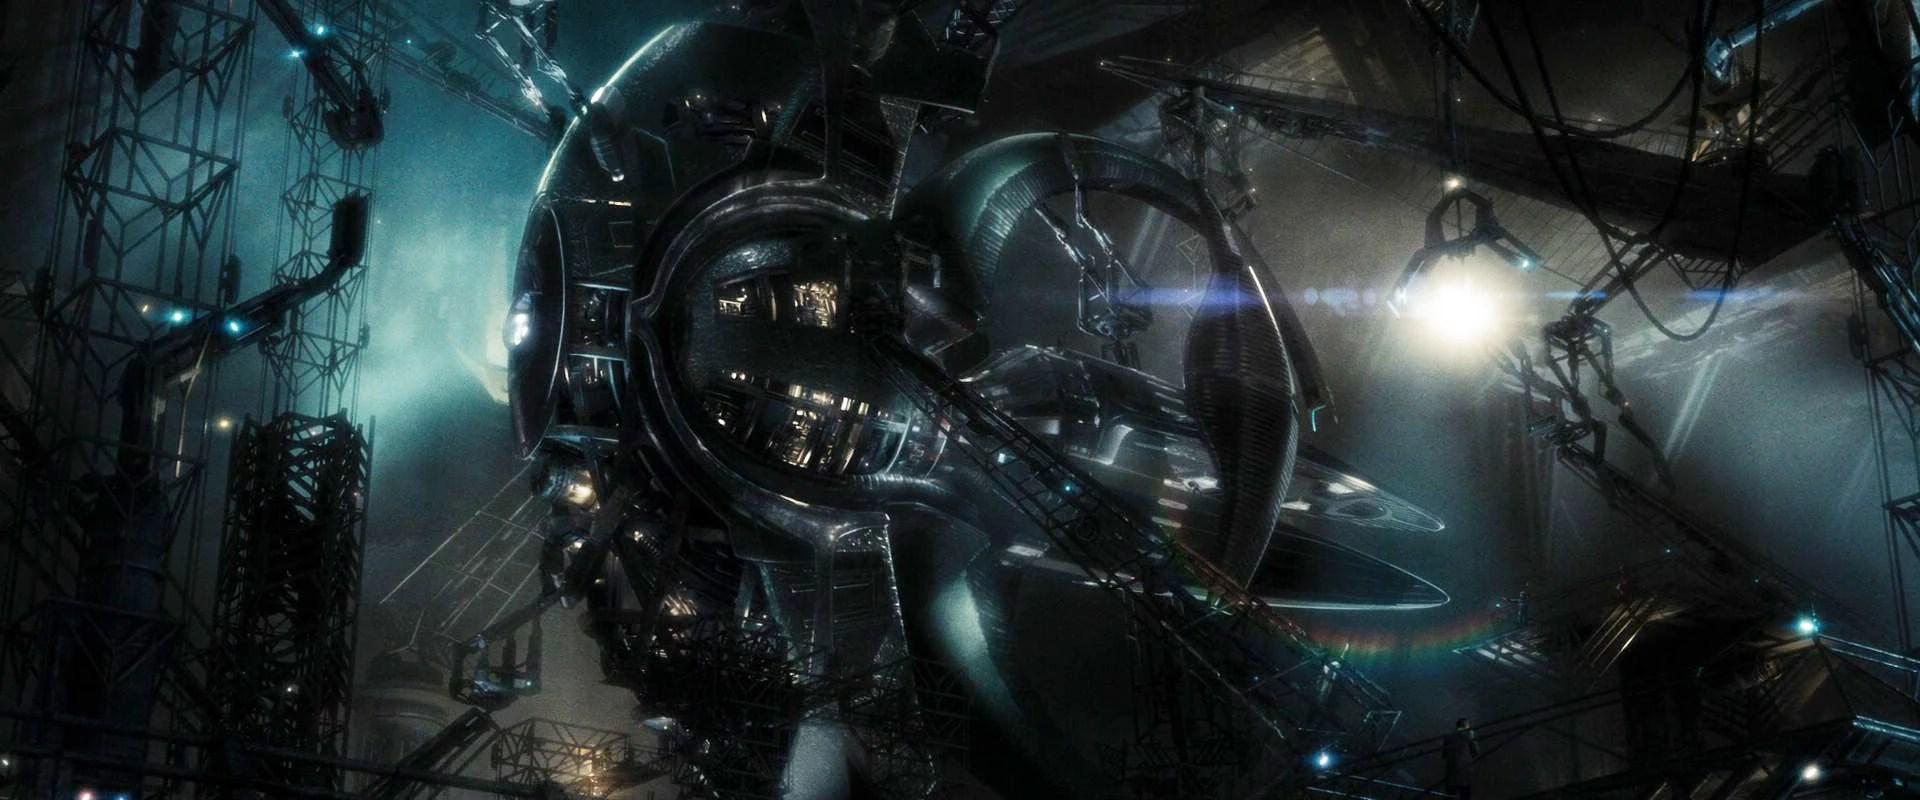 Black Wallpaper Jellyfish Ship Memory Alpha The Star Trek Wiki